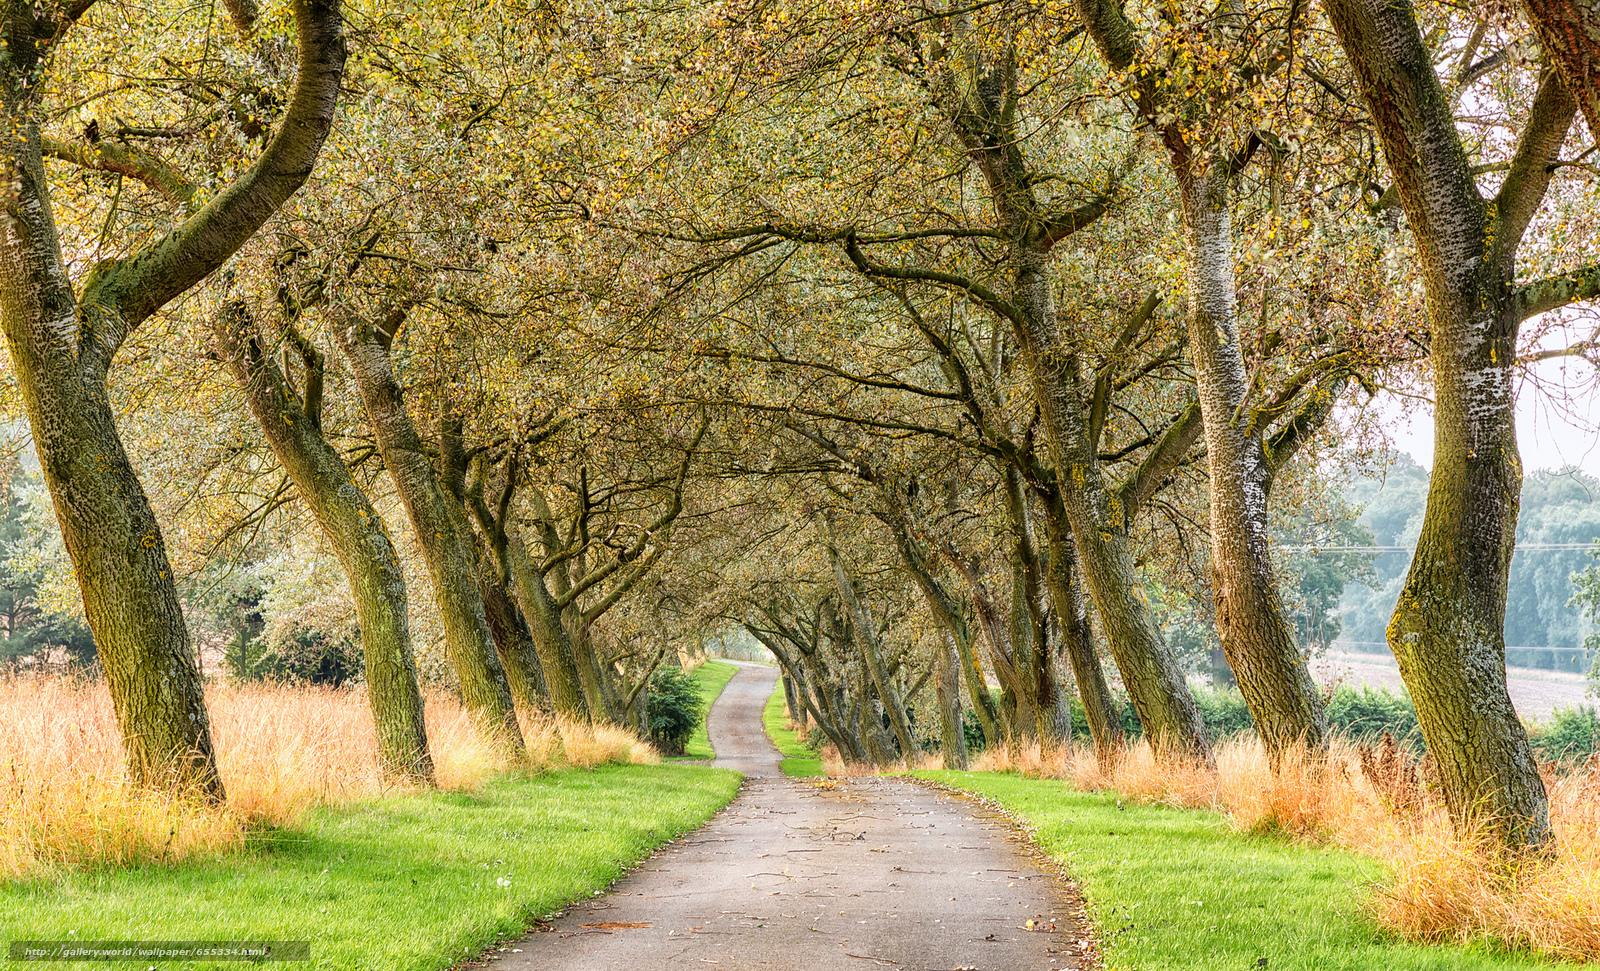 Download wallpaper road,  trees,  landscape free desktop wallpaper in the resolution 2048x1243 — picture №655334